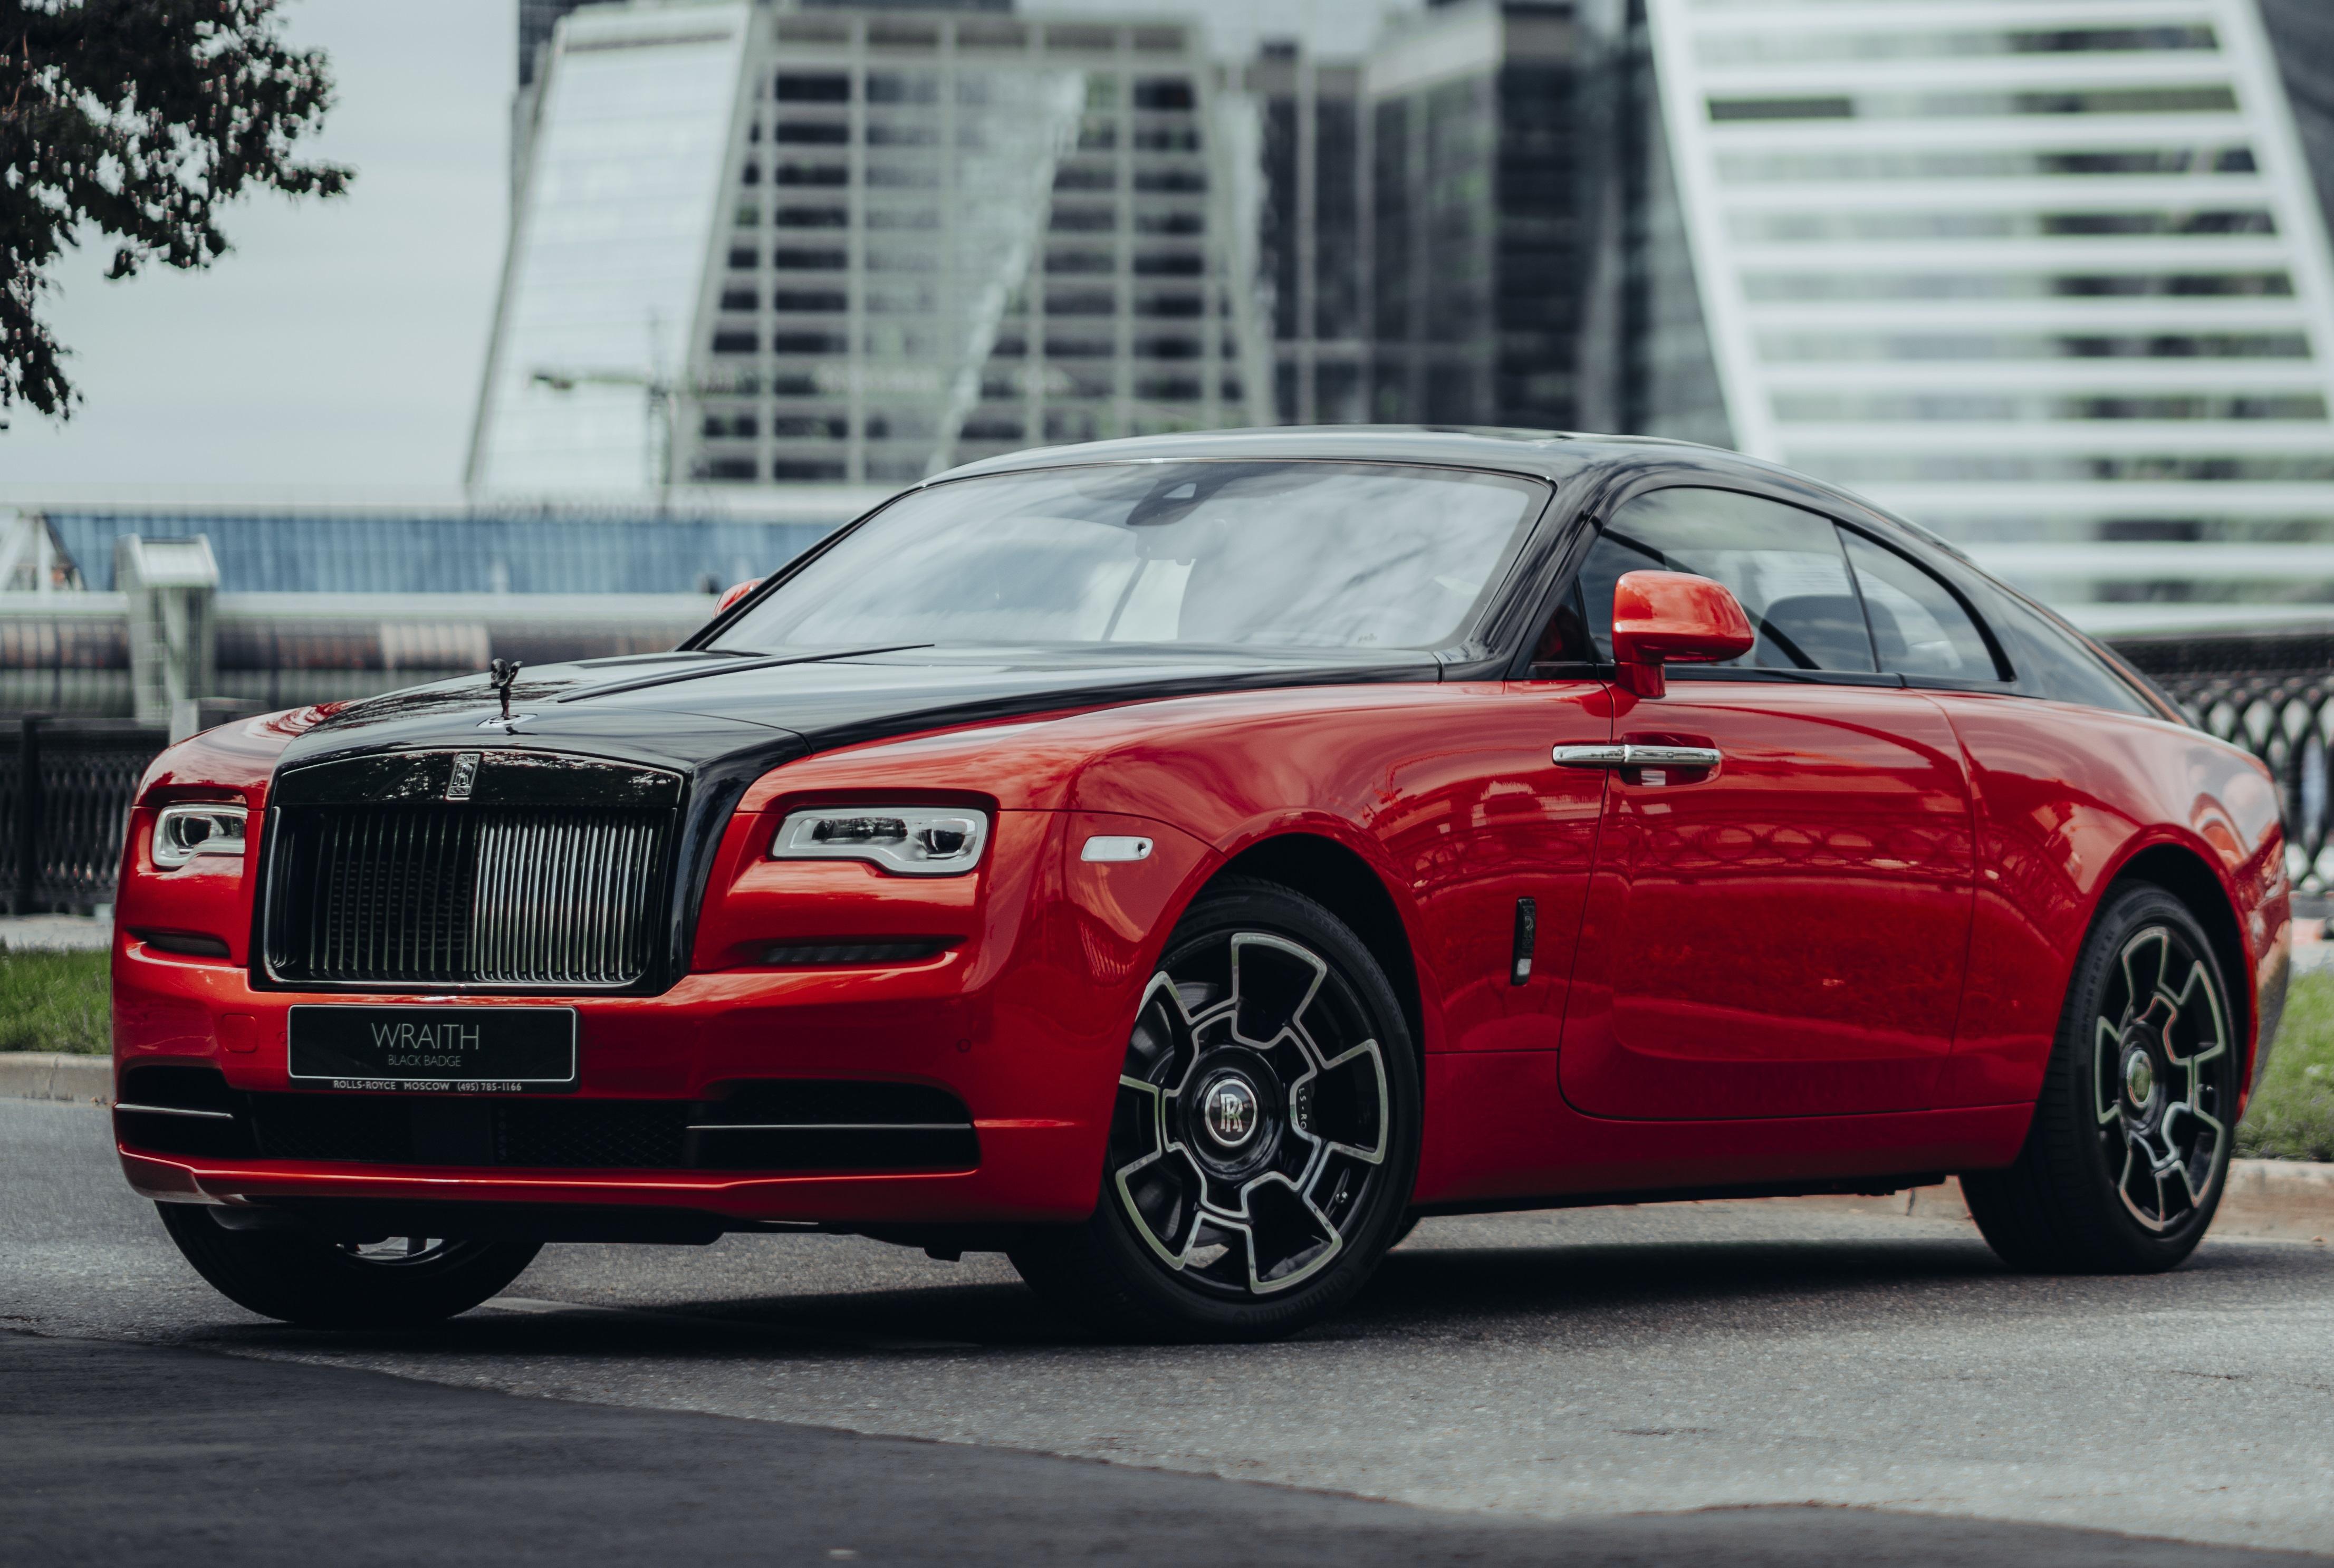 Ngam bo suu tap Rolls-Royce dac biet 'Dem Moscow' hinh anh 15